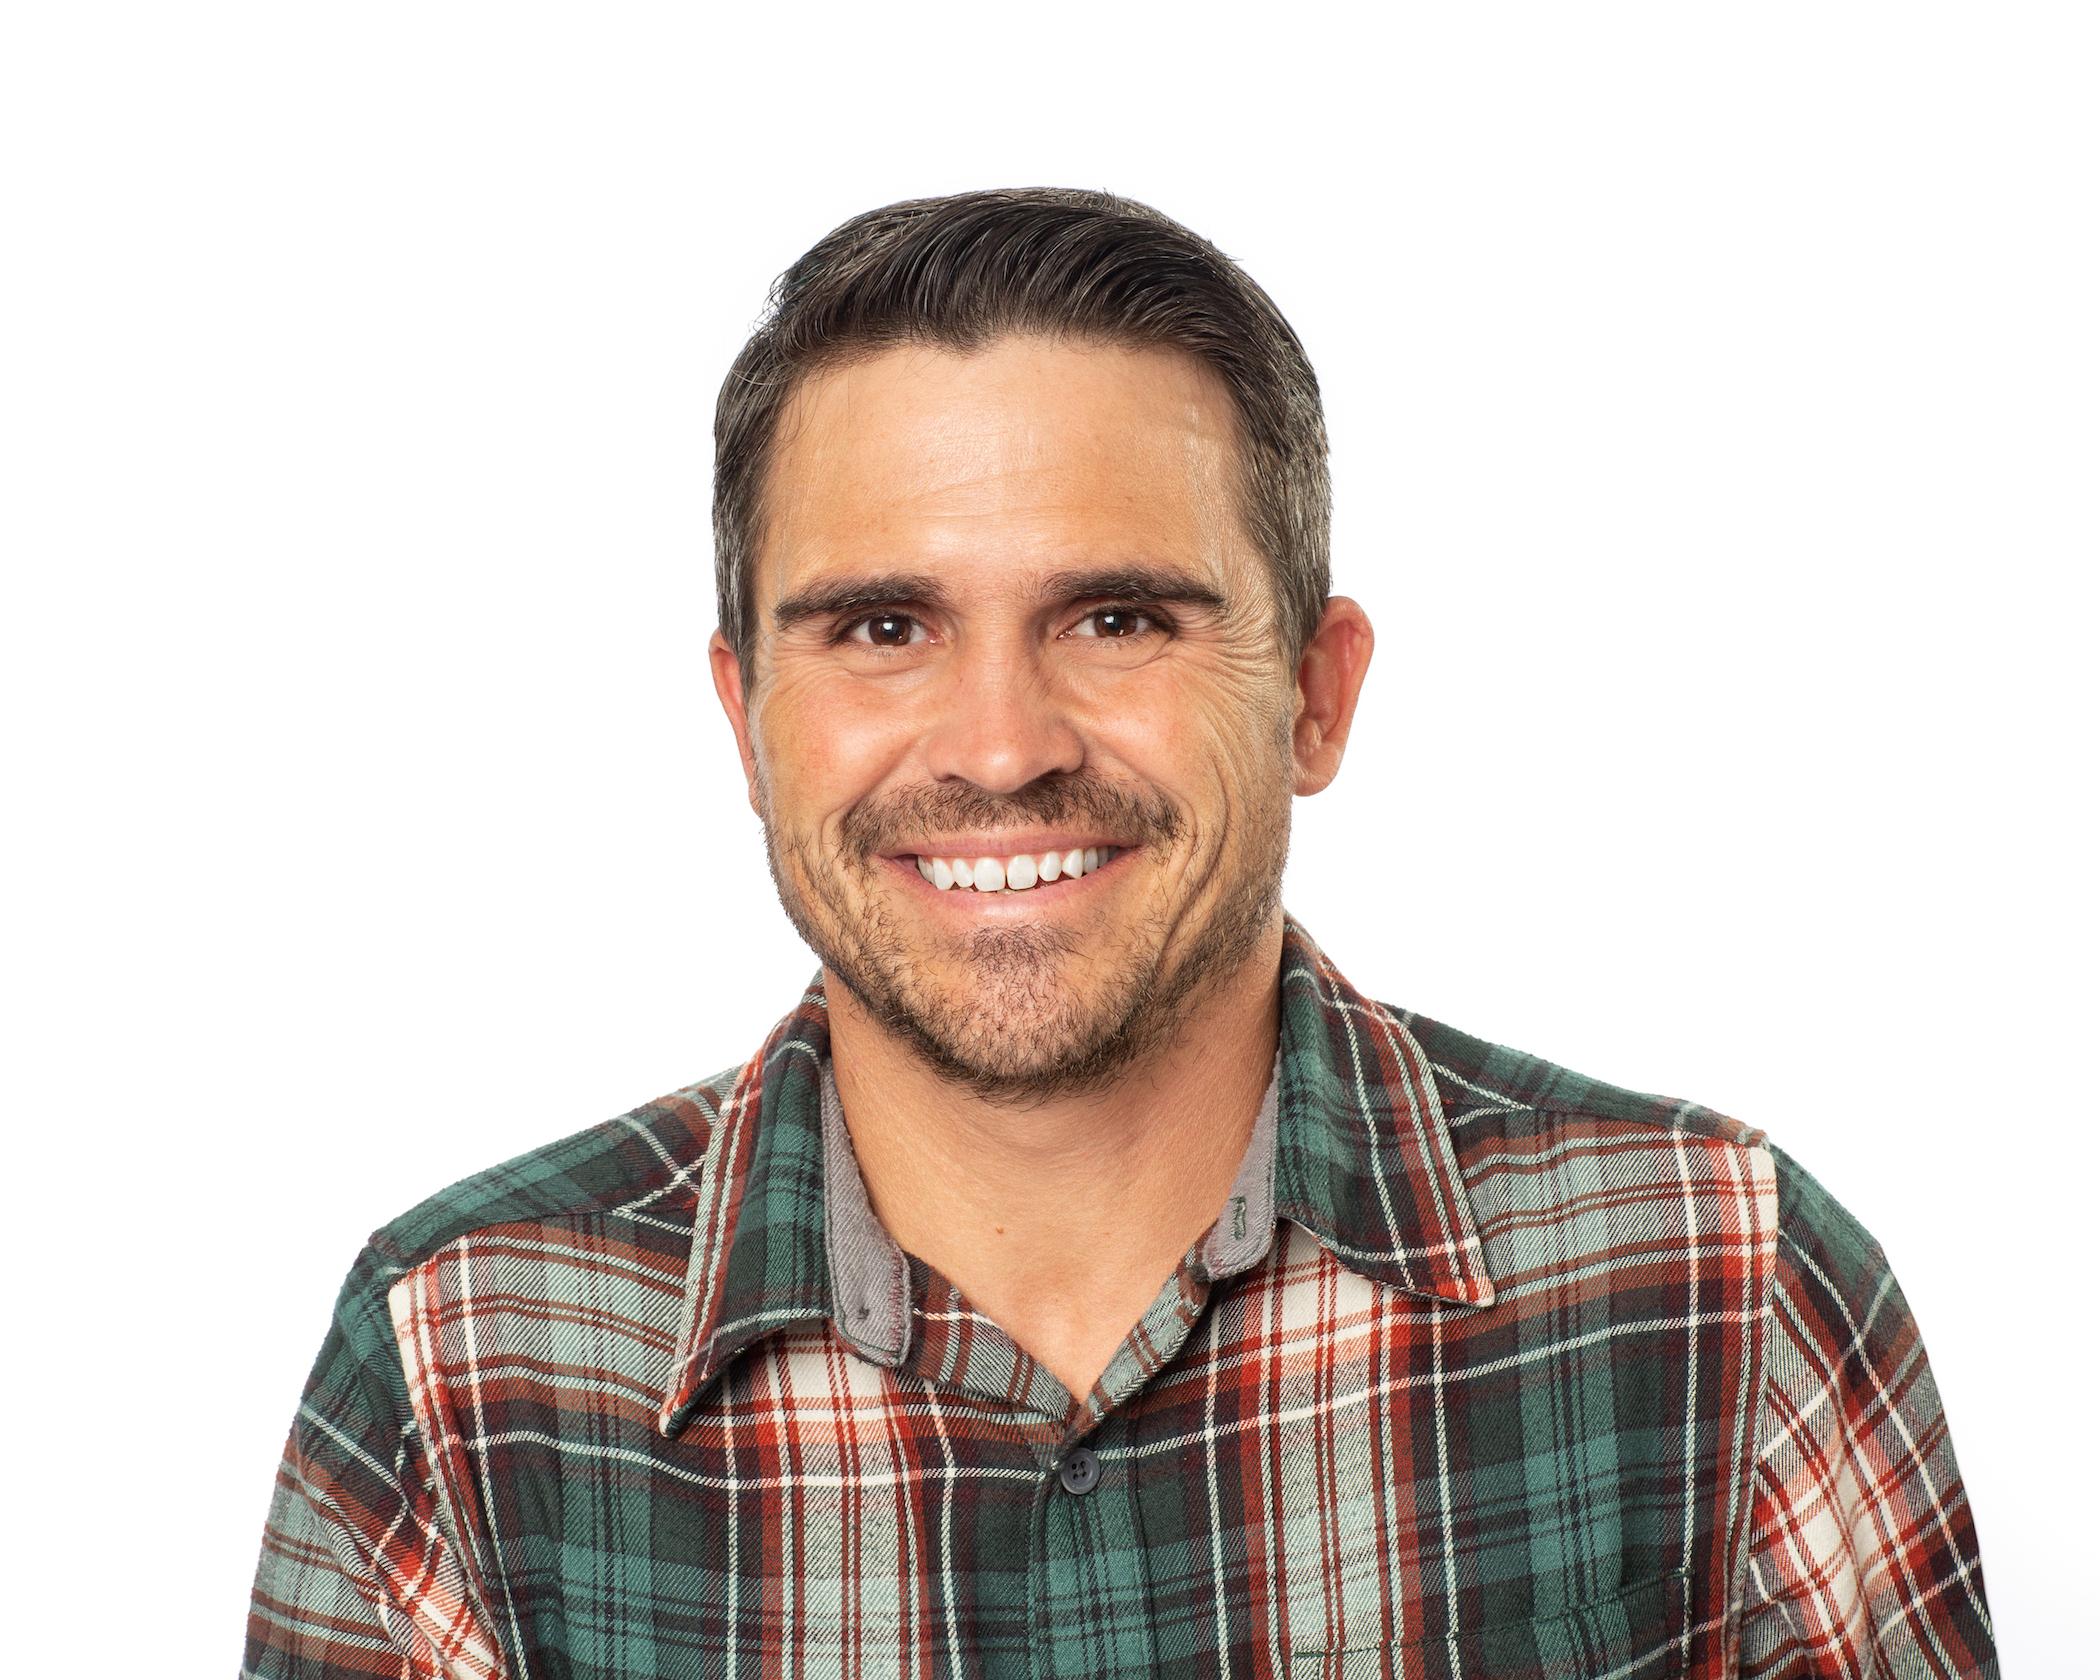 Andrew J. Petrillo